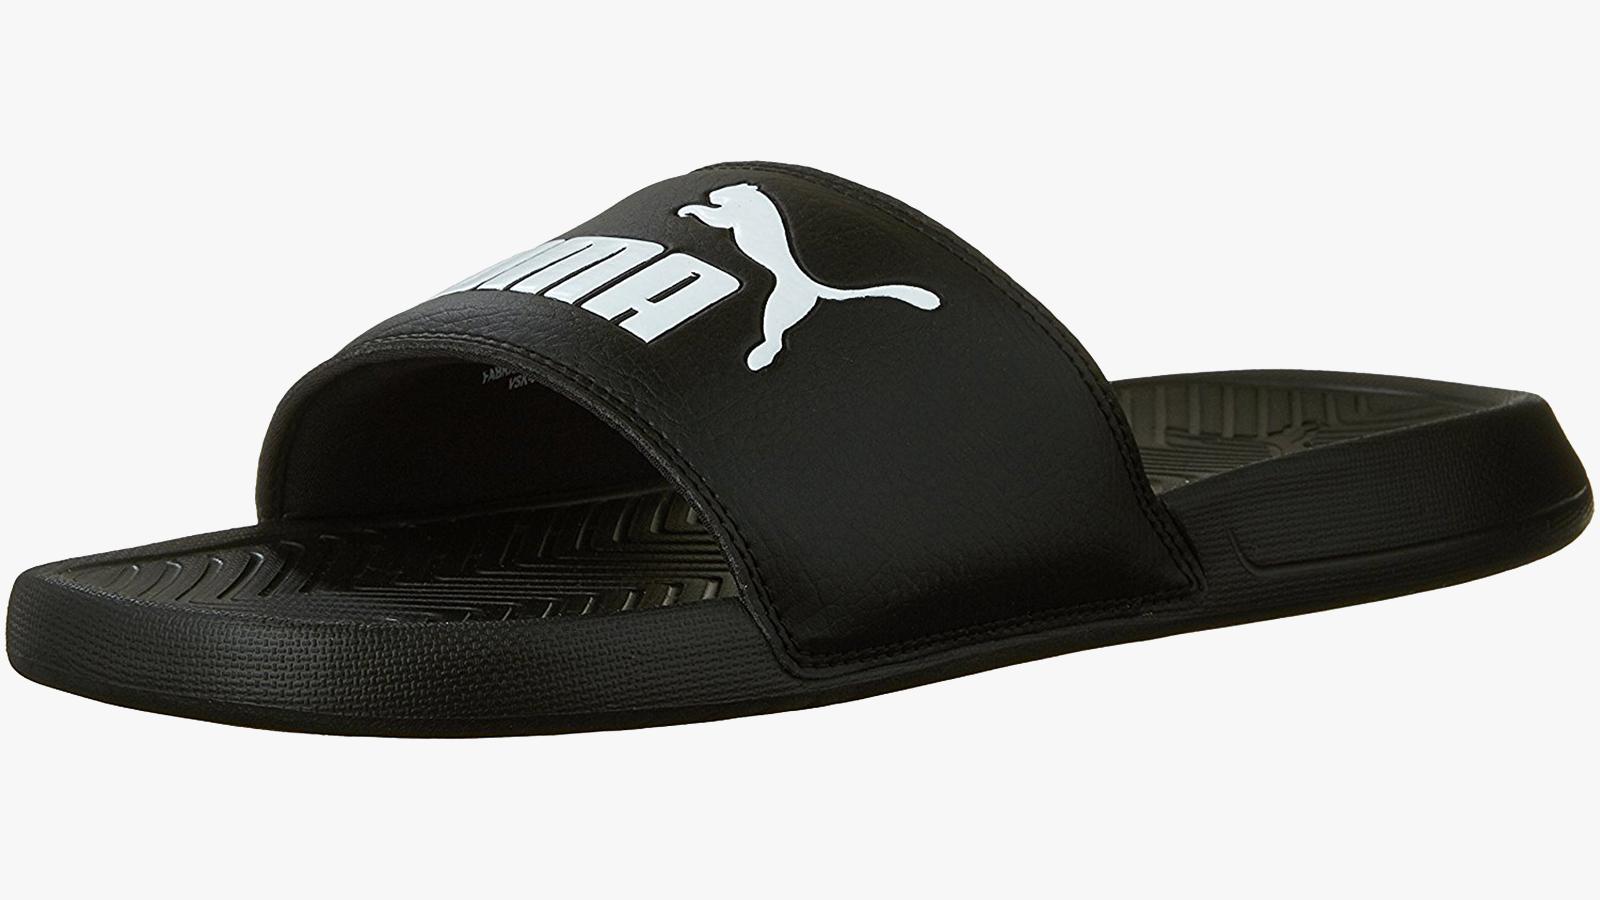 Puma Best Men's Slides